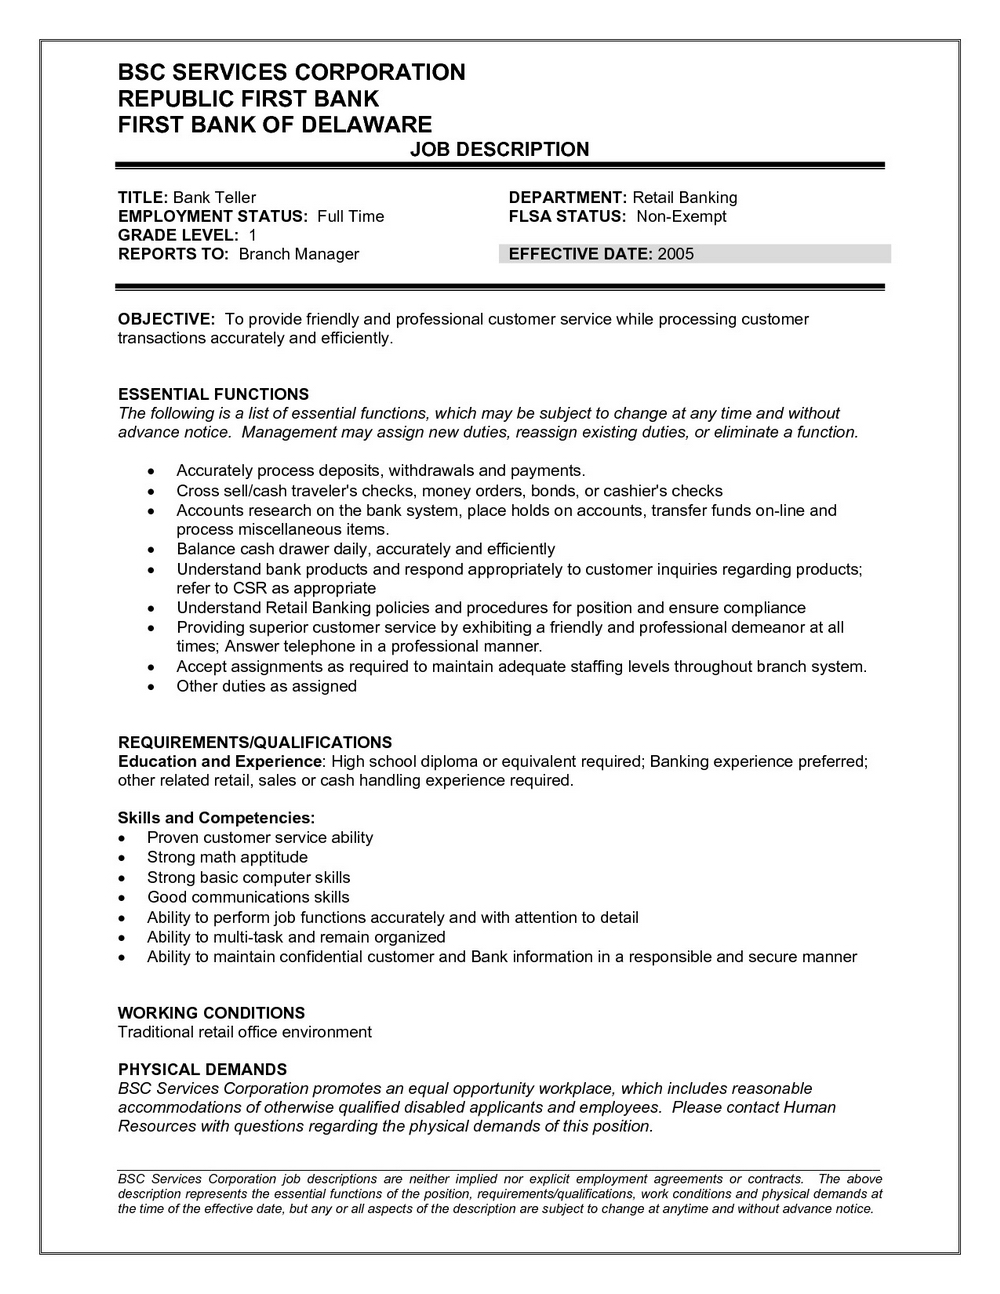 Resume Examples For Teller Position